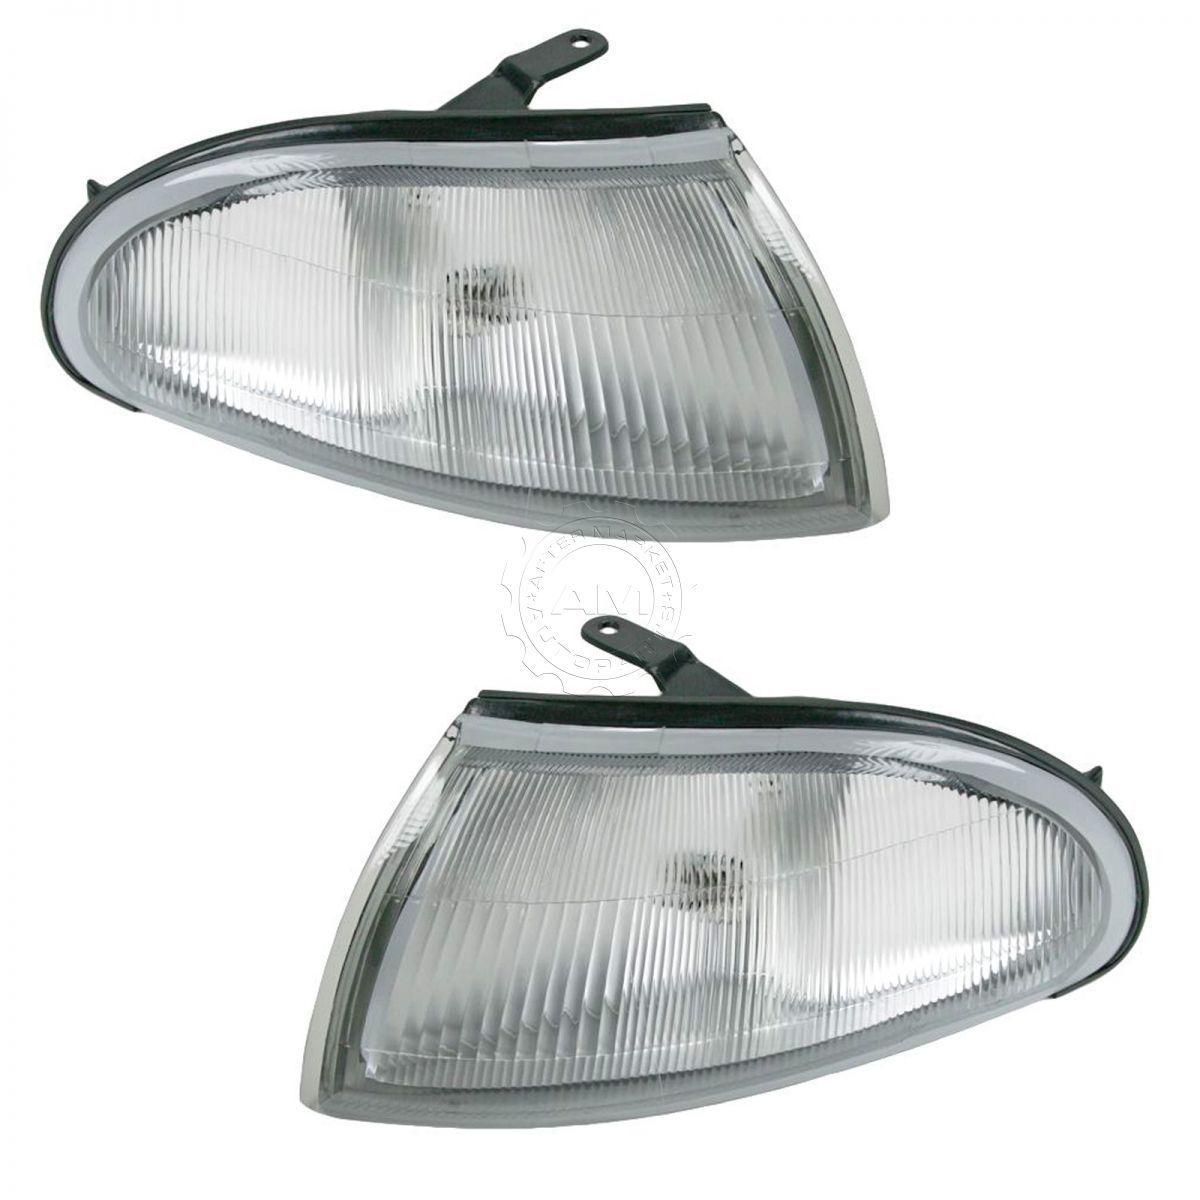 USコーナーライト Corner Side Marker Turn Signal Parking Light Lamp Pair Set for 93-97 Prizm コーナーサイドマーカーターンシグナル93-97 Prizm用駐車ライトランプペアセット